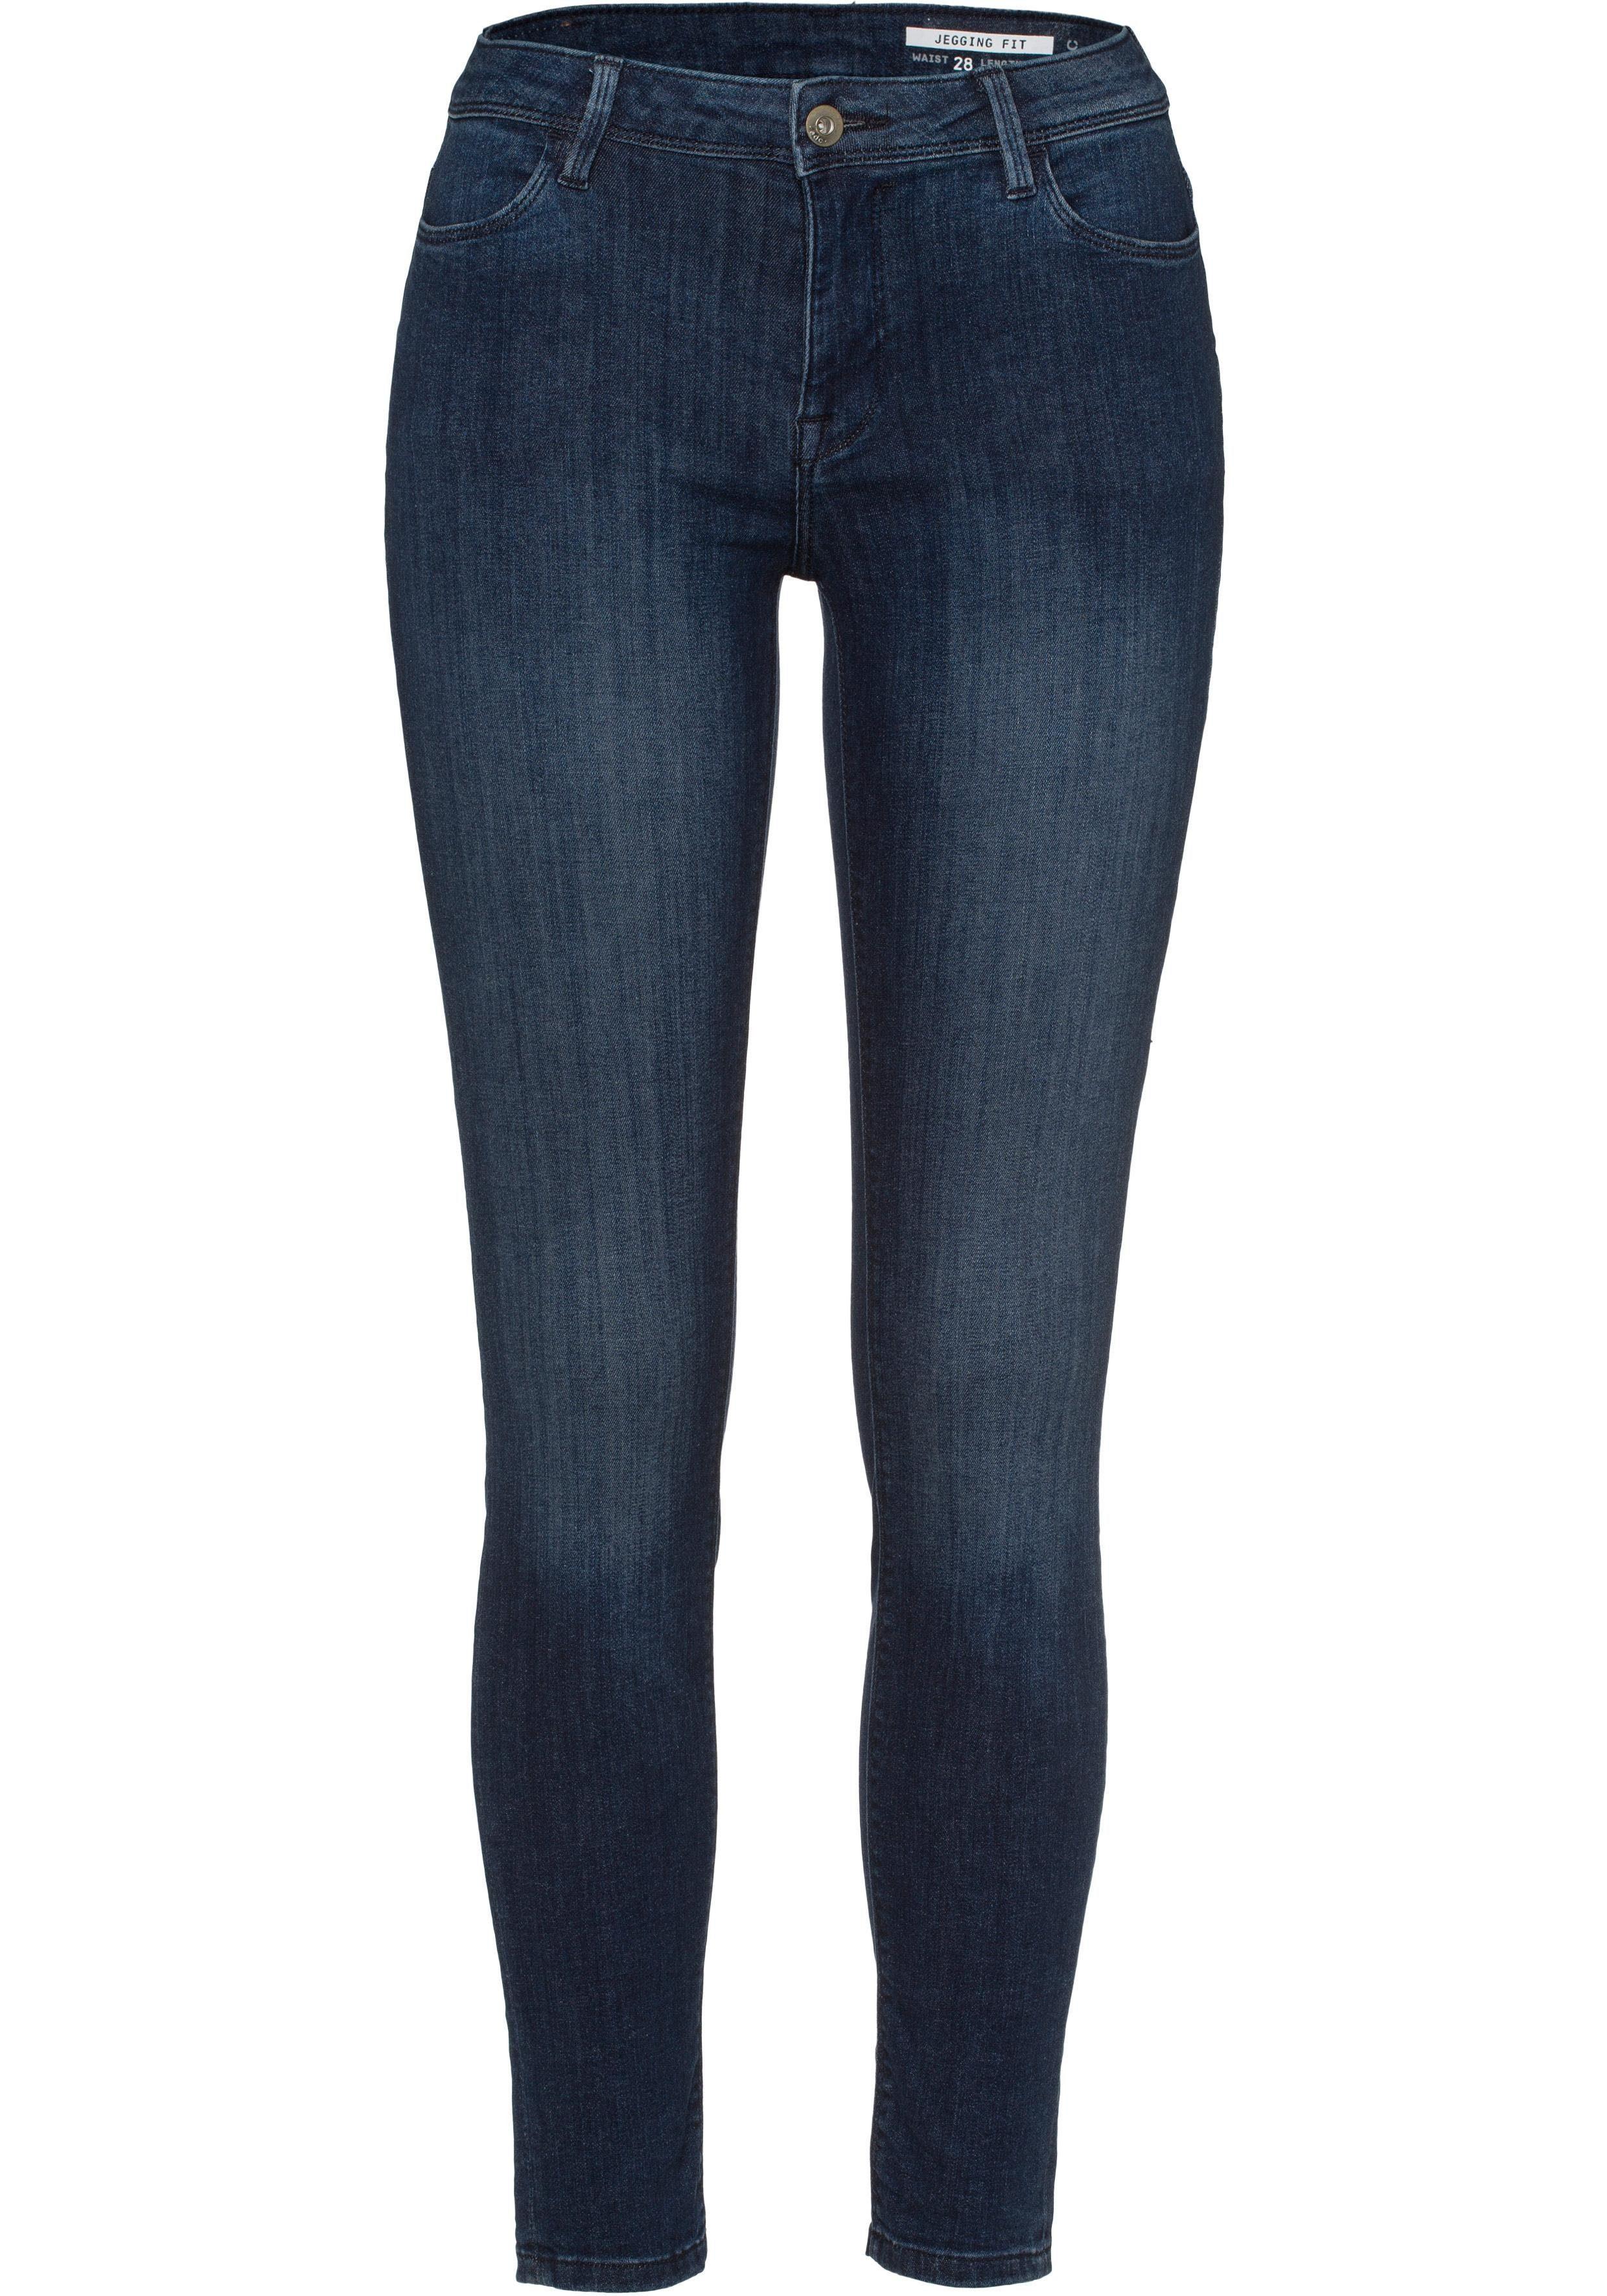 By Slim Fit Edc Jeans Esprit m8OnNwPyv0